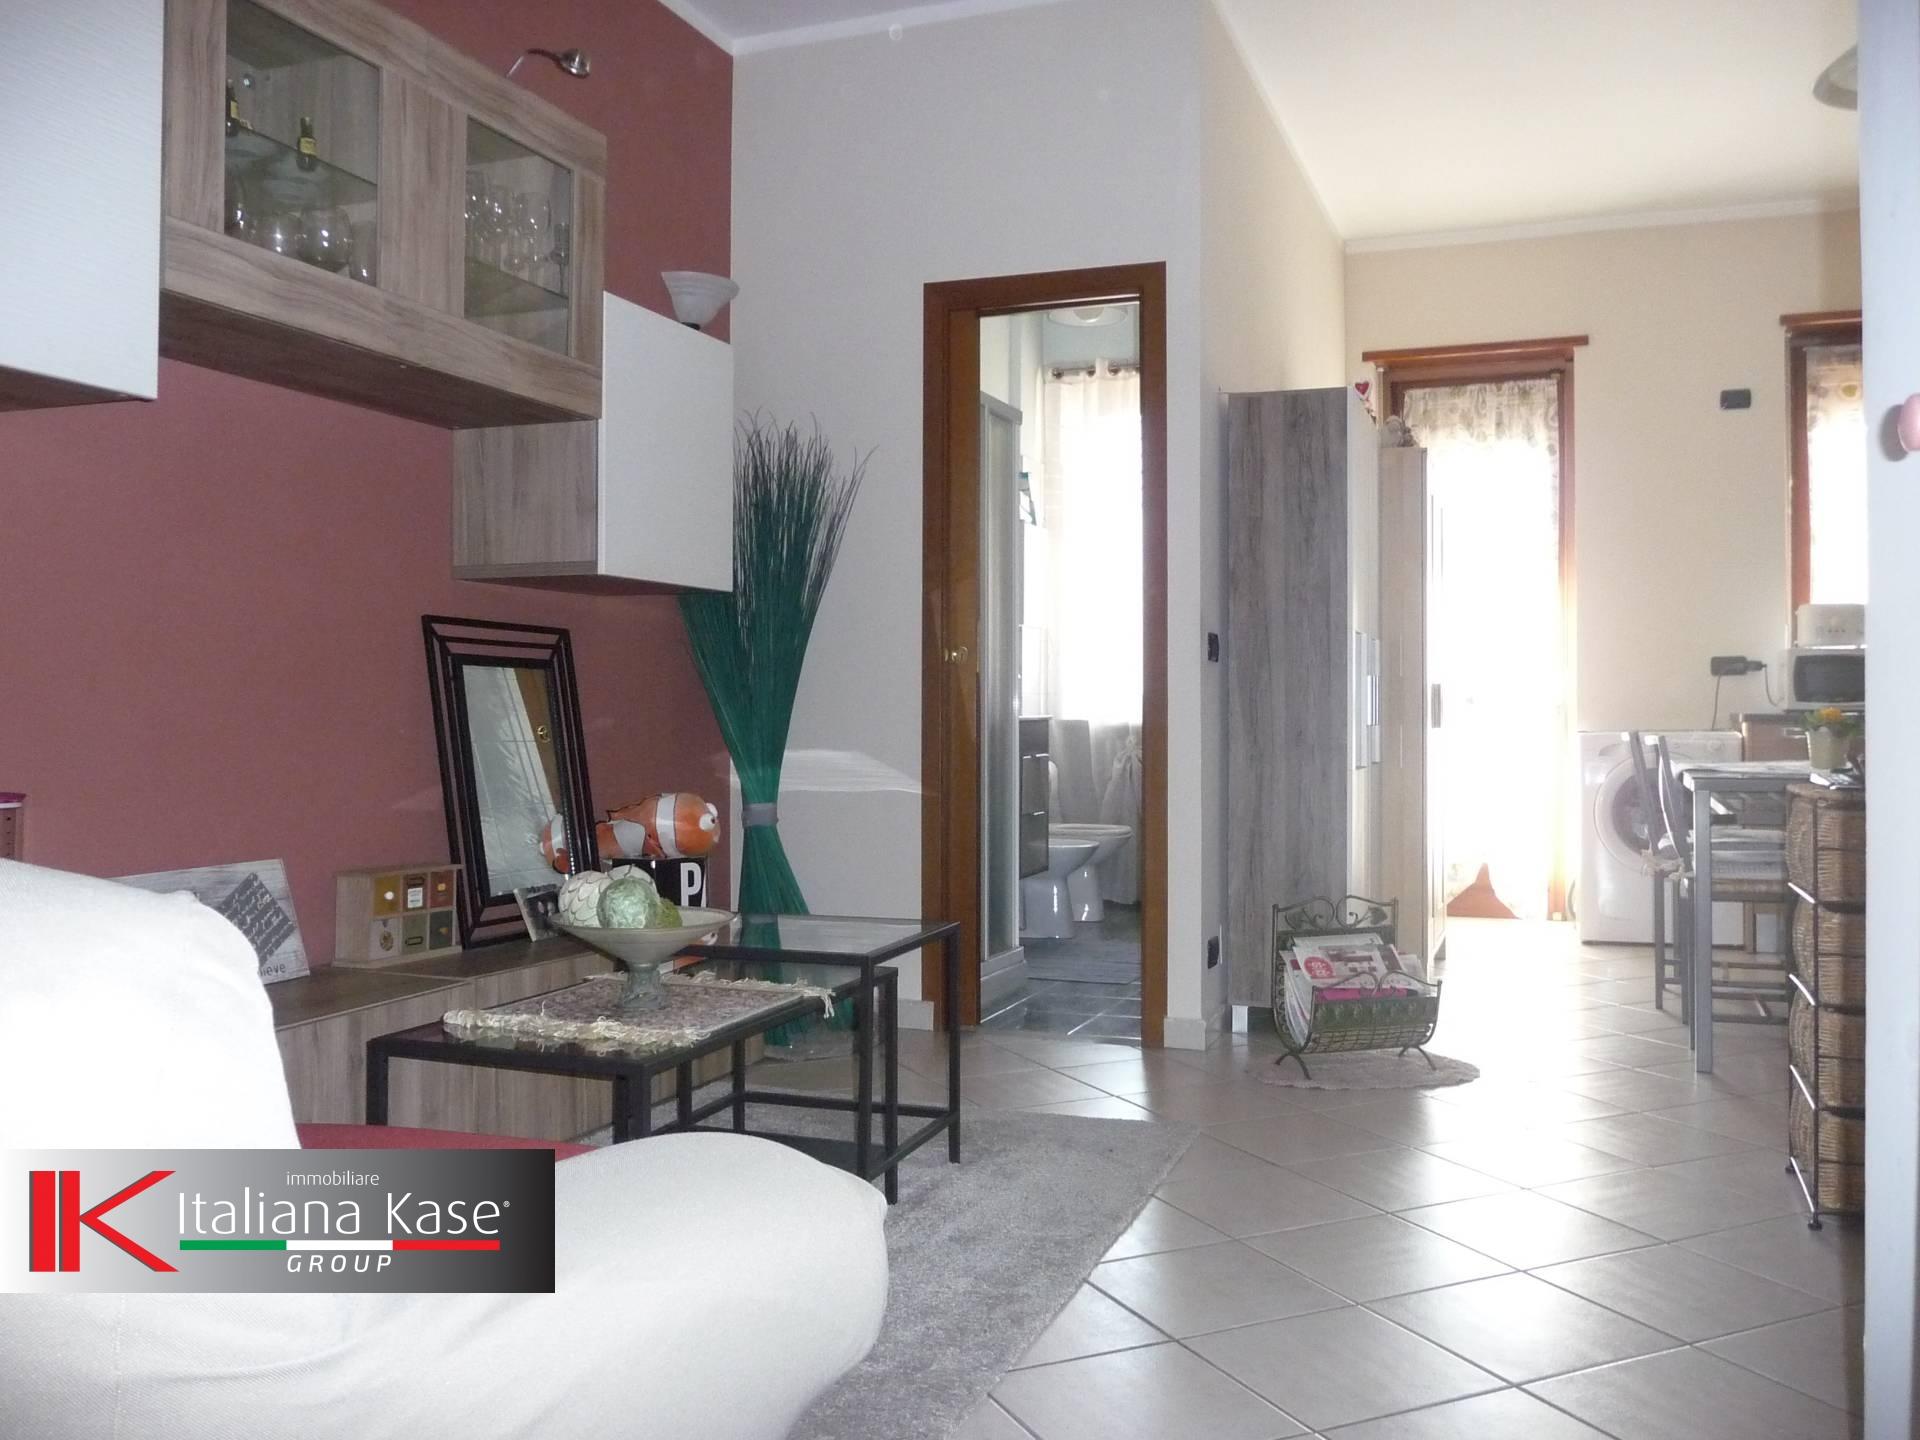 Bilocale Settimo Torinese Via Sondrio 3